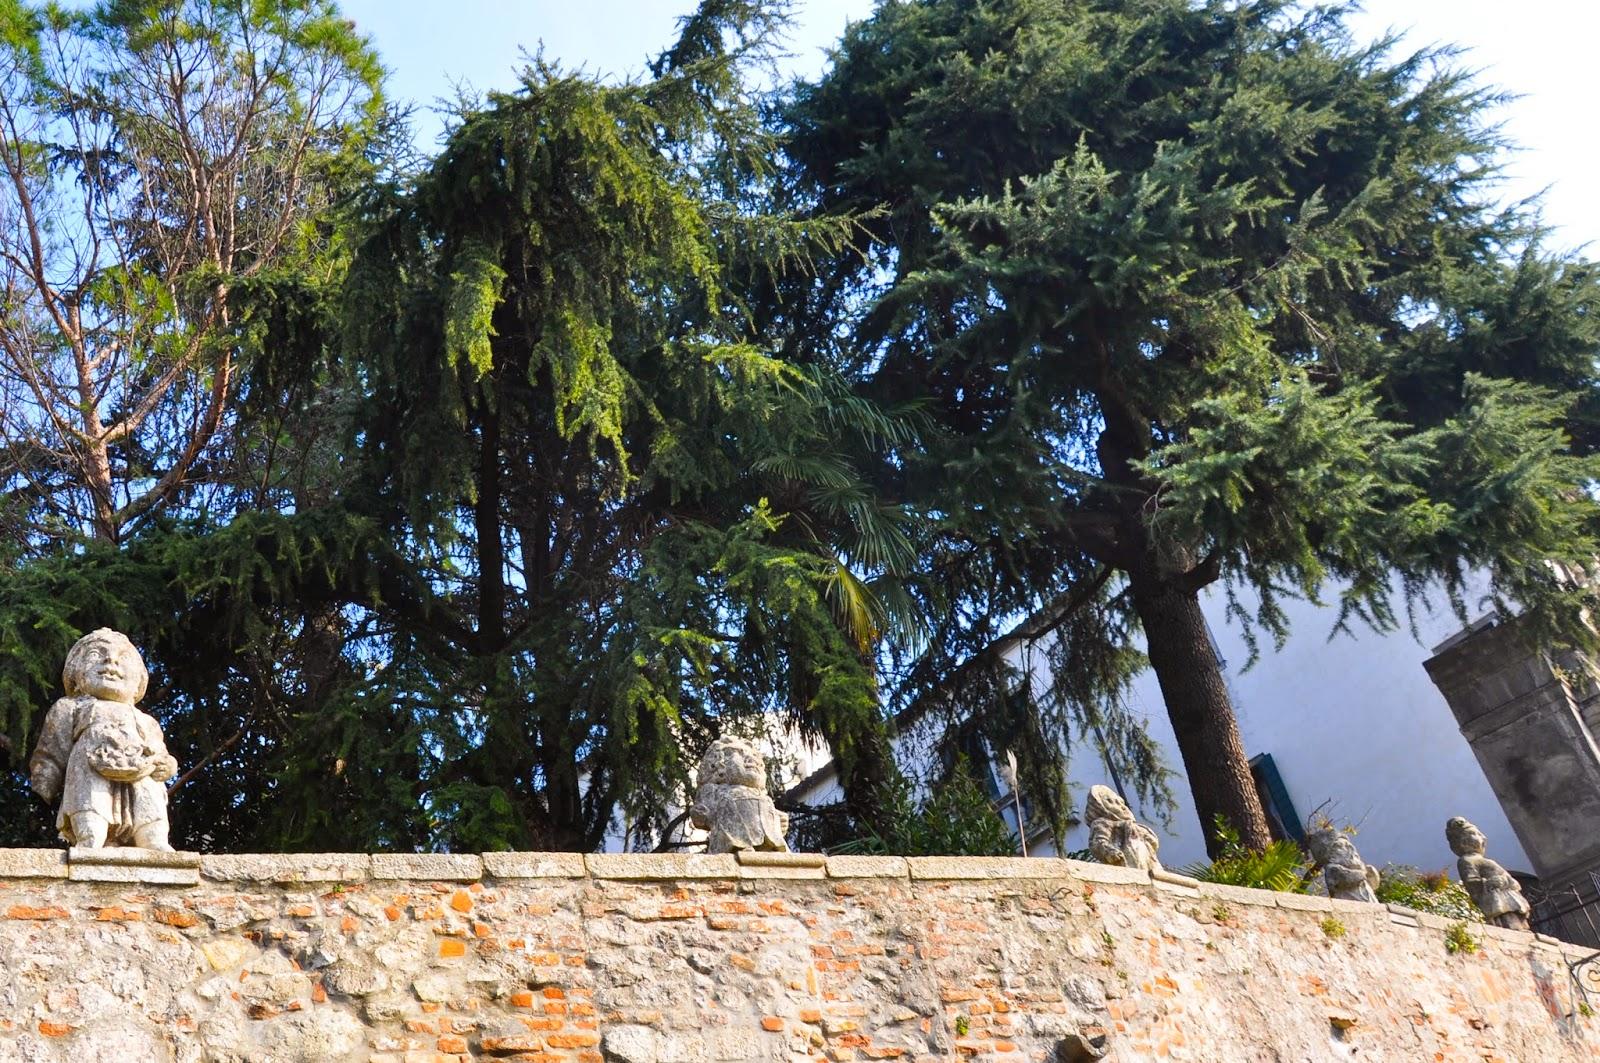 dwarves wall Villa Nani-Mocenigo Monselice Italy